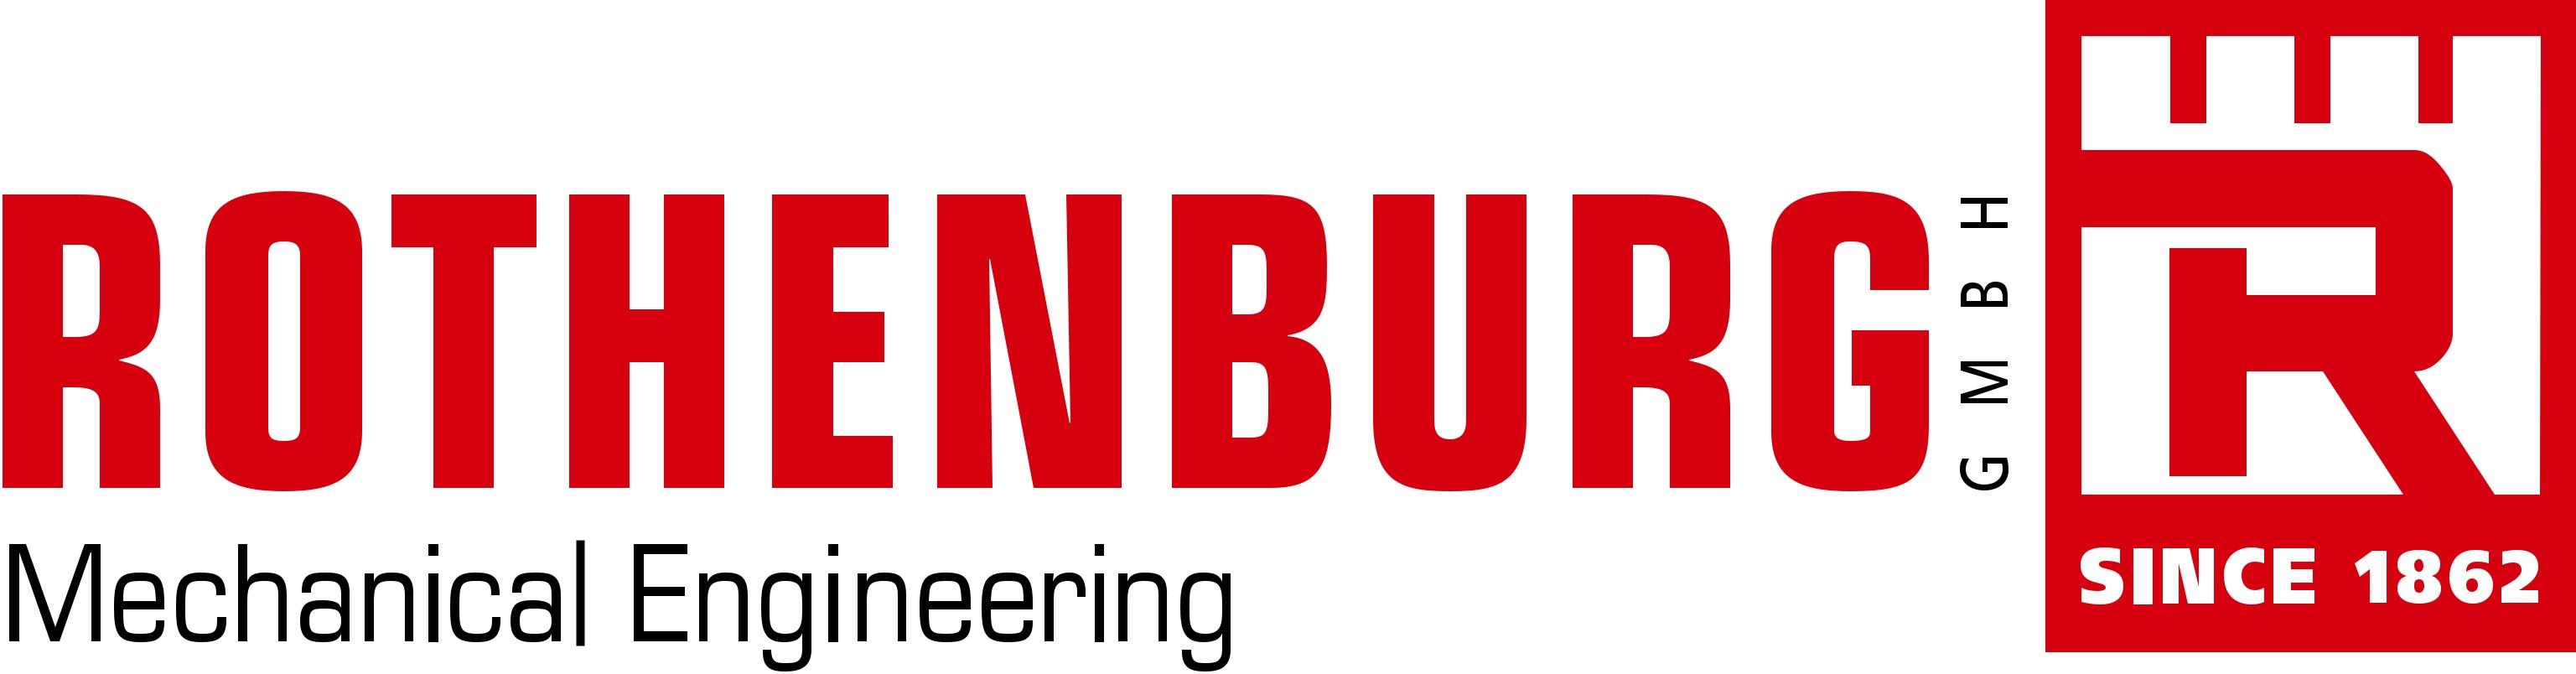 Rothenburg logo